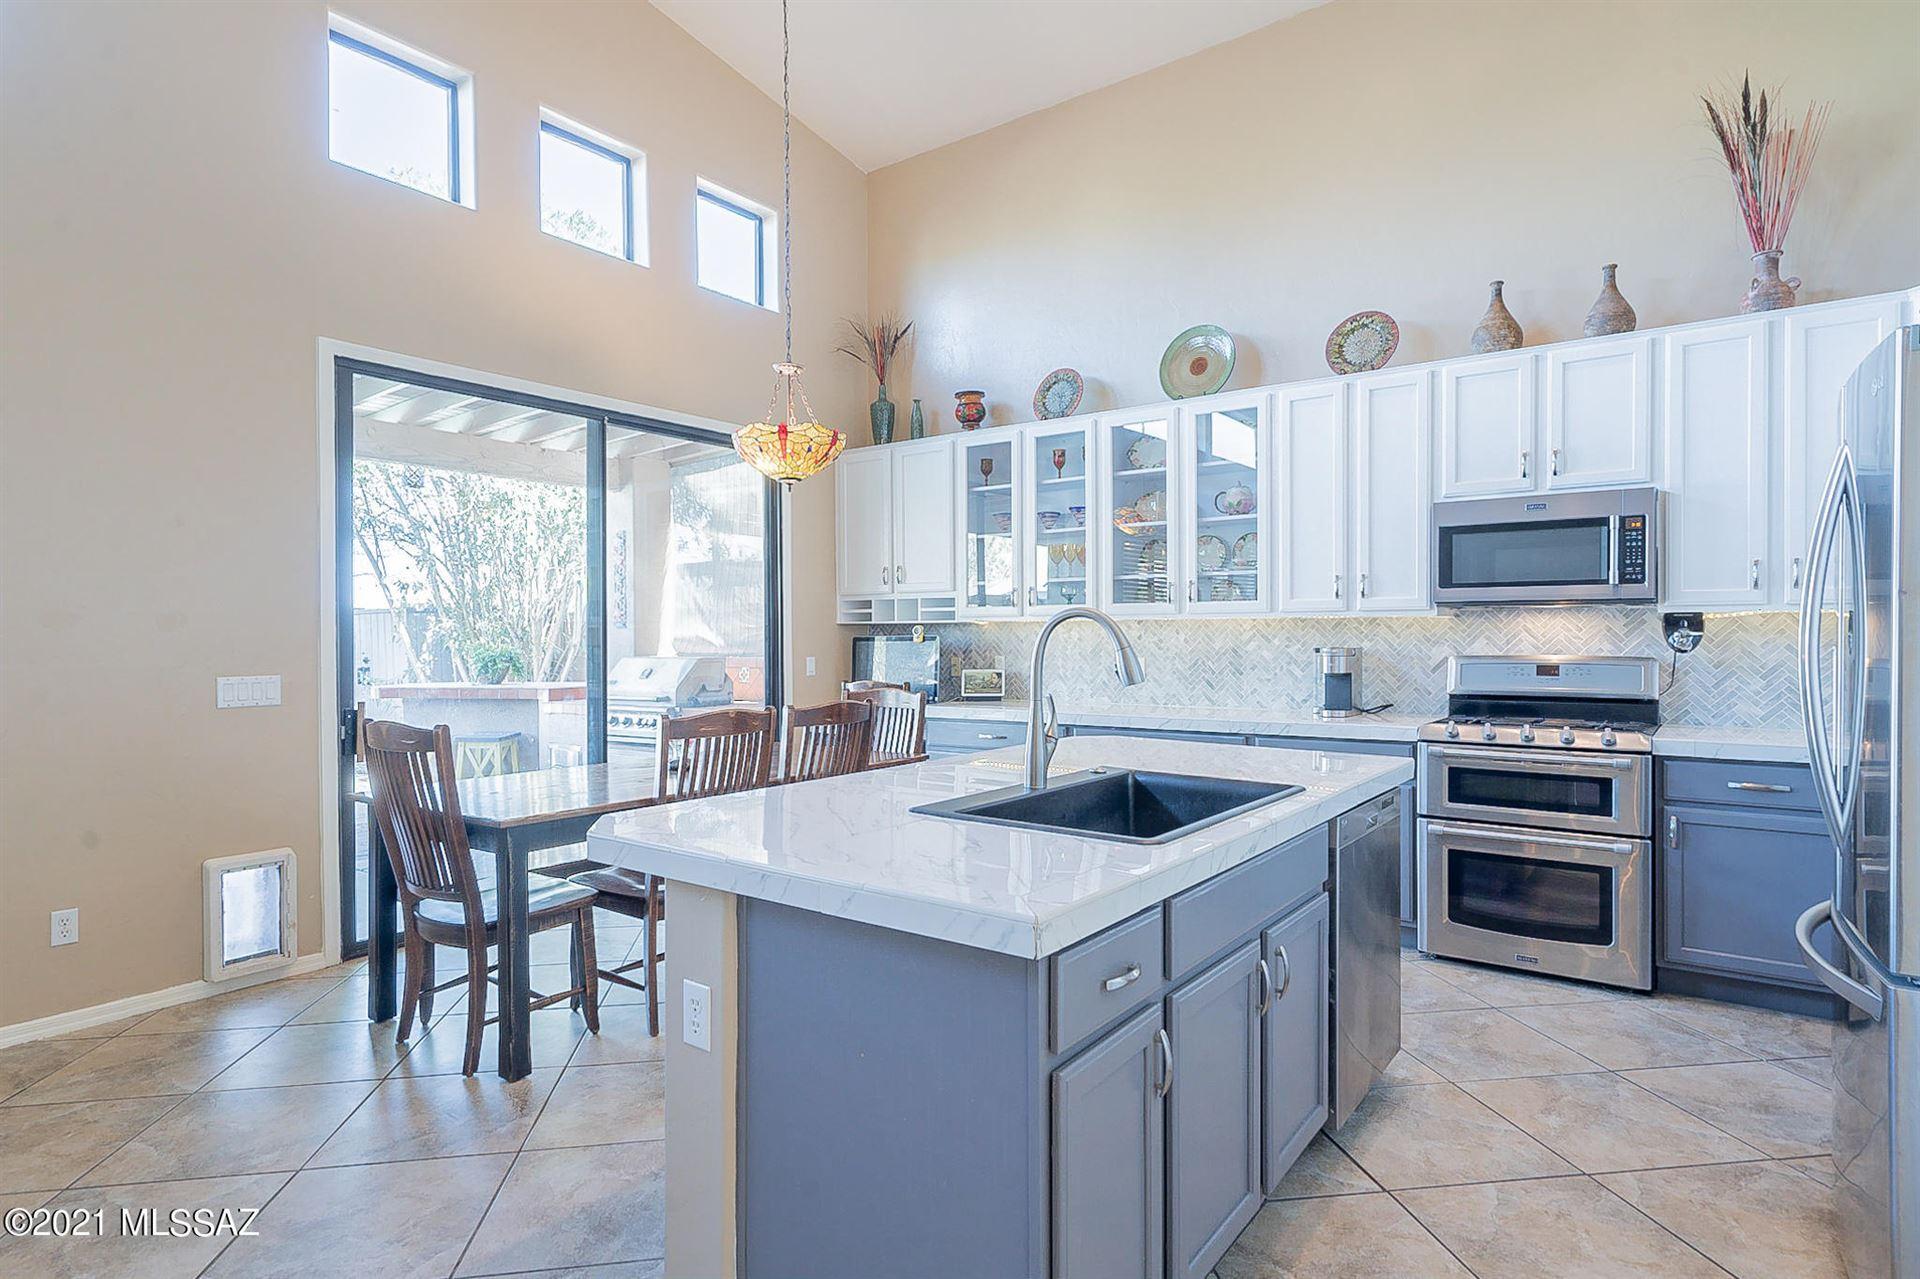 15197 S Avenida Rancho Verde, Sahuarita, AZ 85629 - MLS#: 22108999